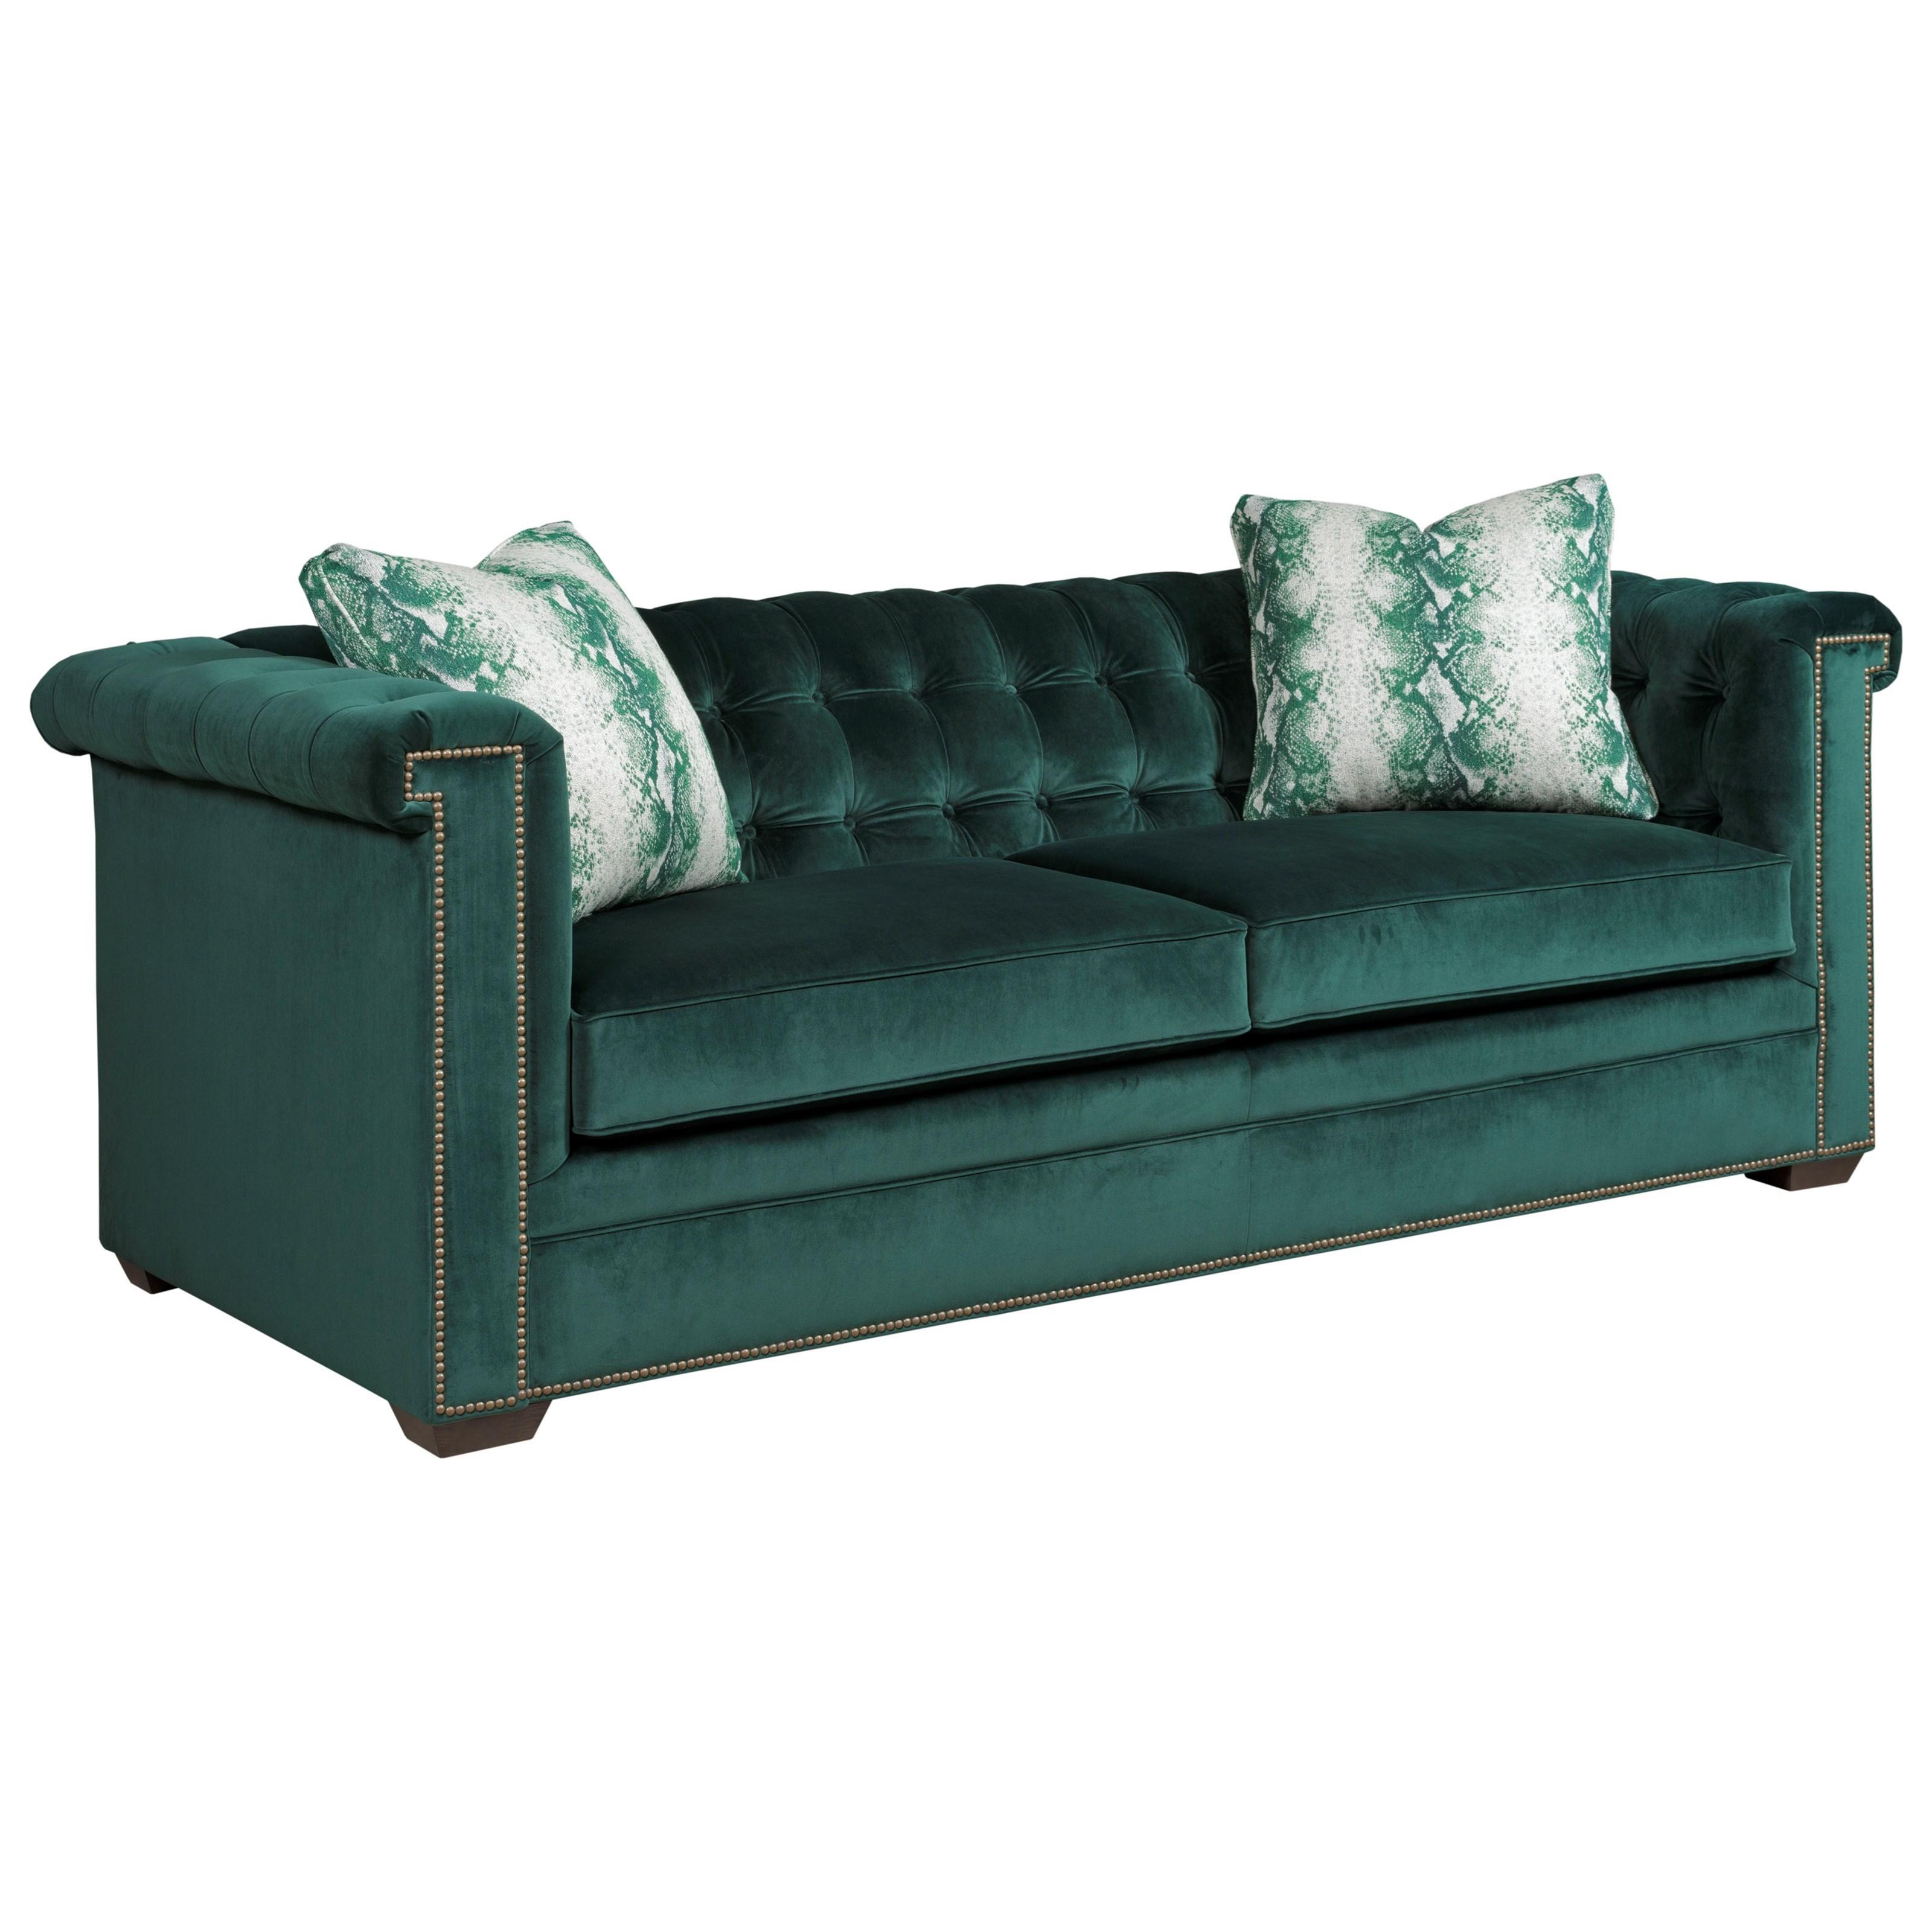 Kingston Sofa by Kincaid Furniture at Johnny Janosik